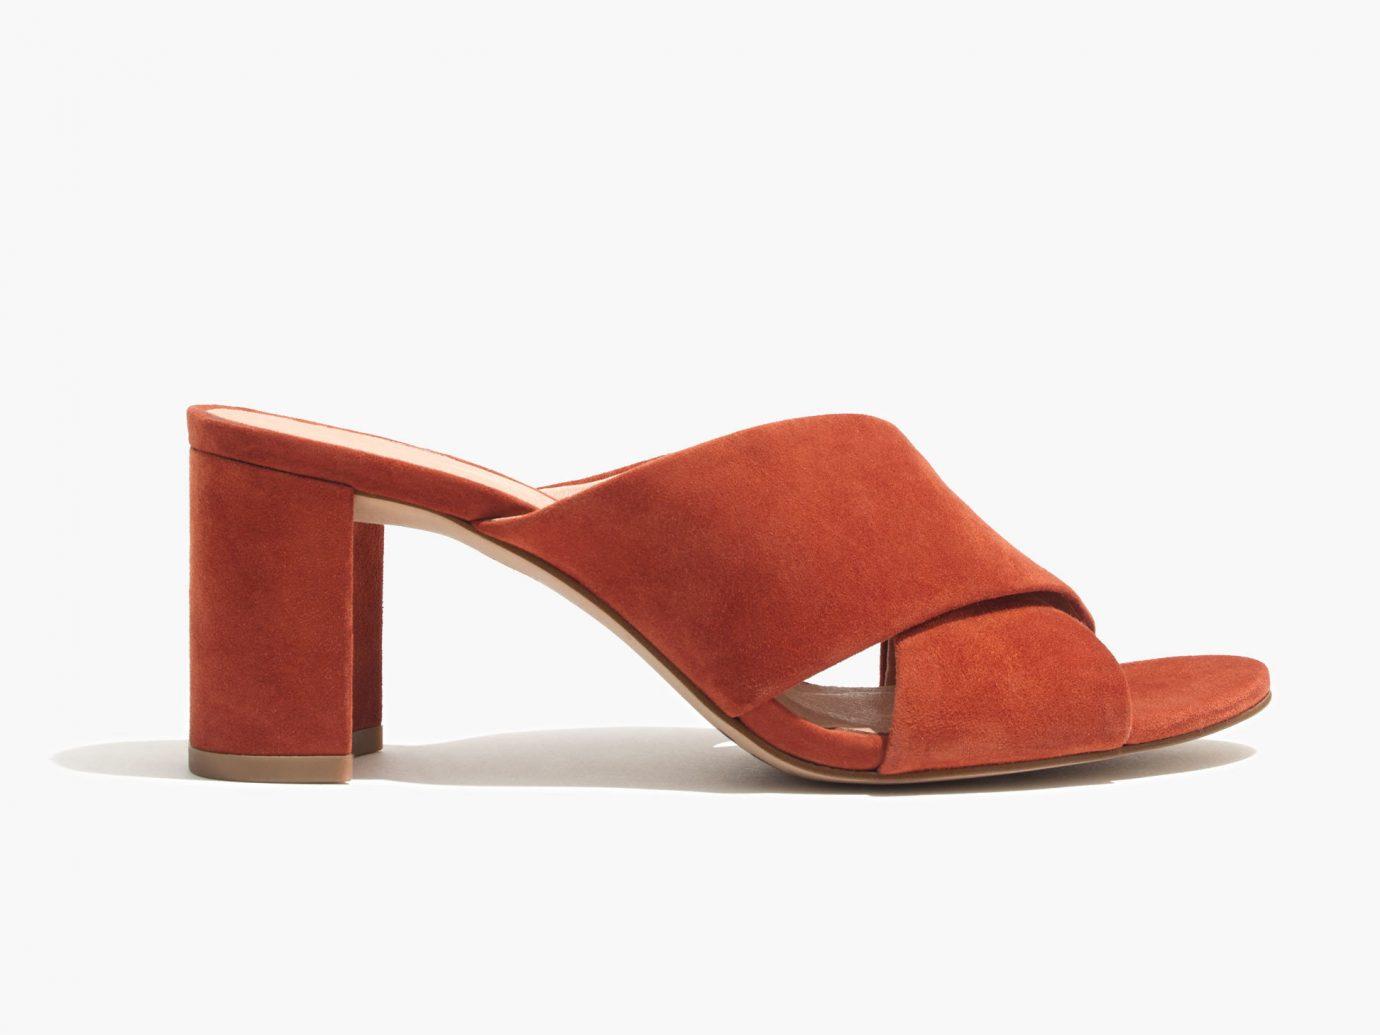 Style + Design footwear leather shoe seat sandal leg chair outdoor shoe textile